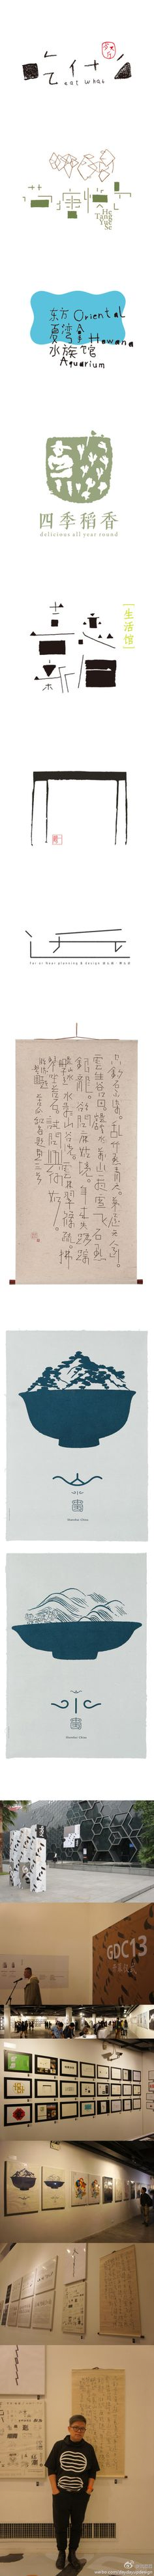 Far or near planning and design logo Kanji Japanese, Japanese Logo, Japanese Typography, Font Design, Branding Design, Web Design, Typography Layout, Typography Letters, Japan Design